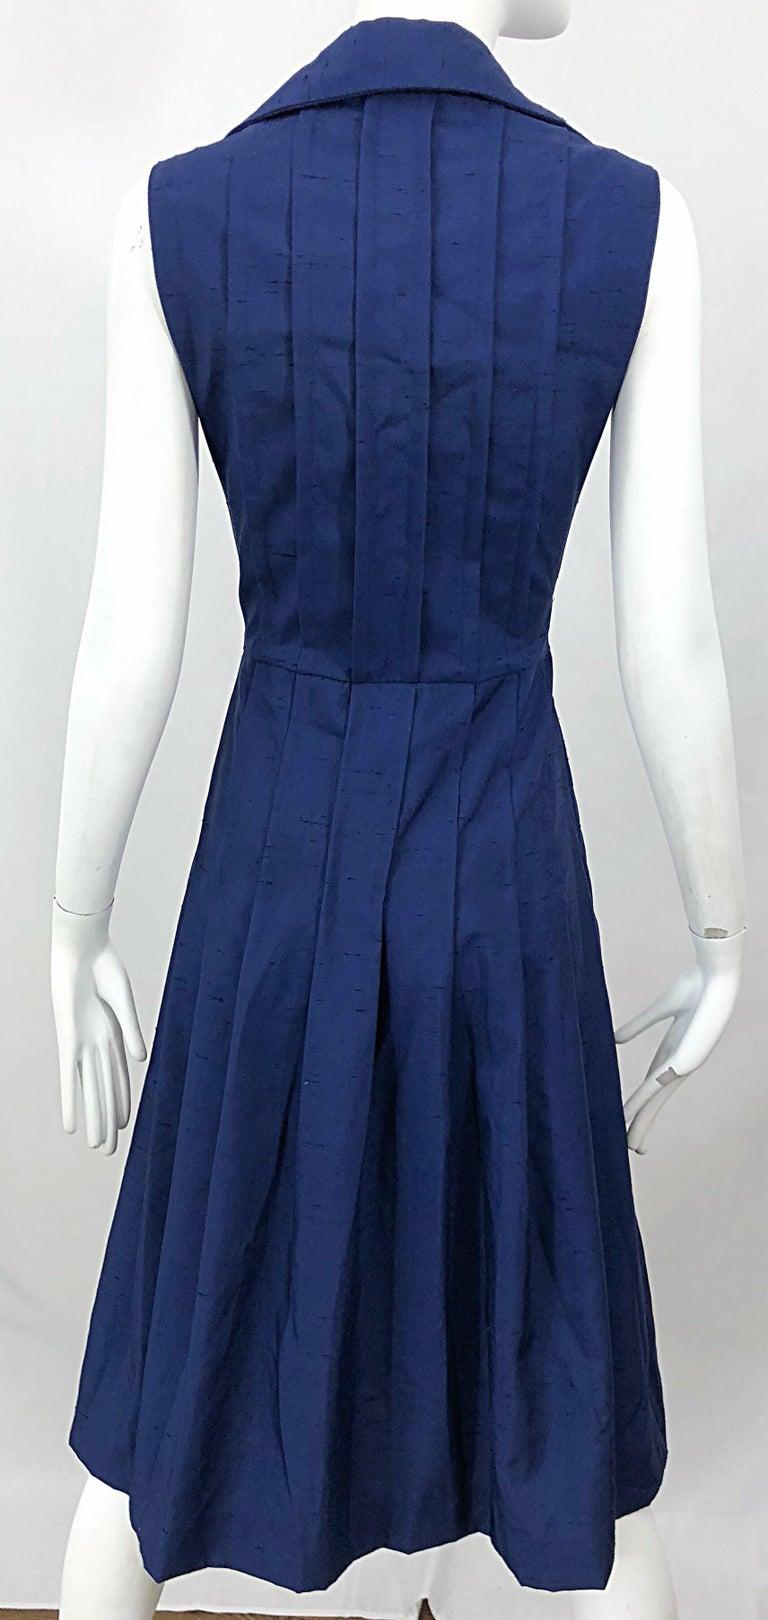 1990s Saks 5th Avenue Size 10 Navy Blue Silk Vintage 90s Sleeveless Shirt Dress For Sale 6